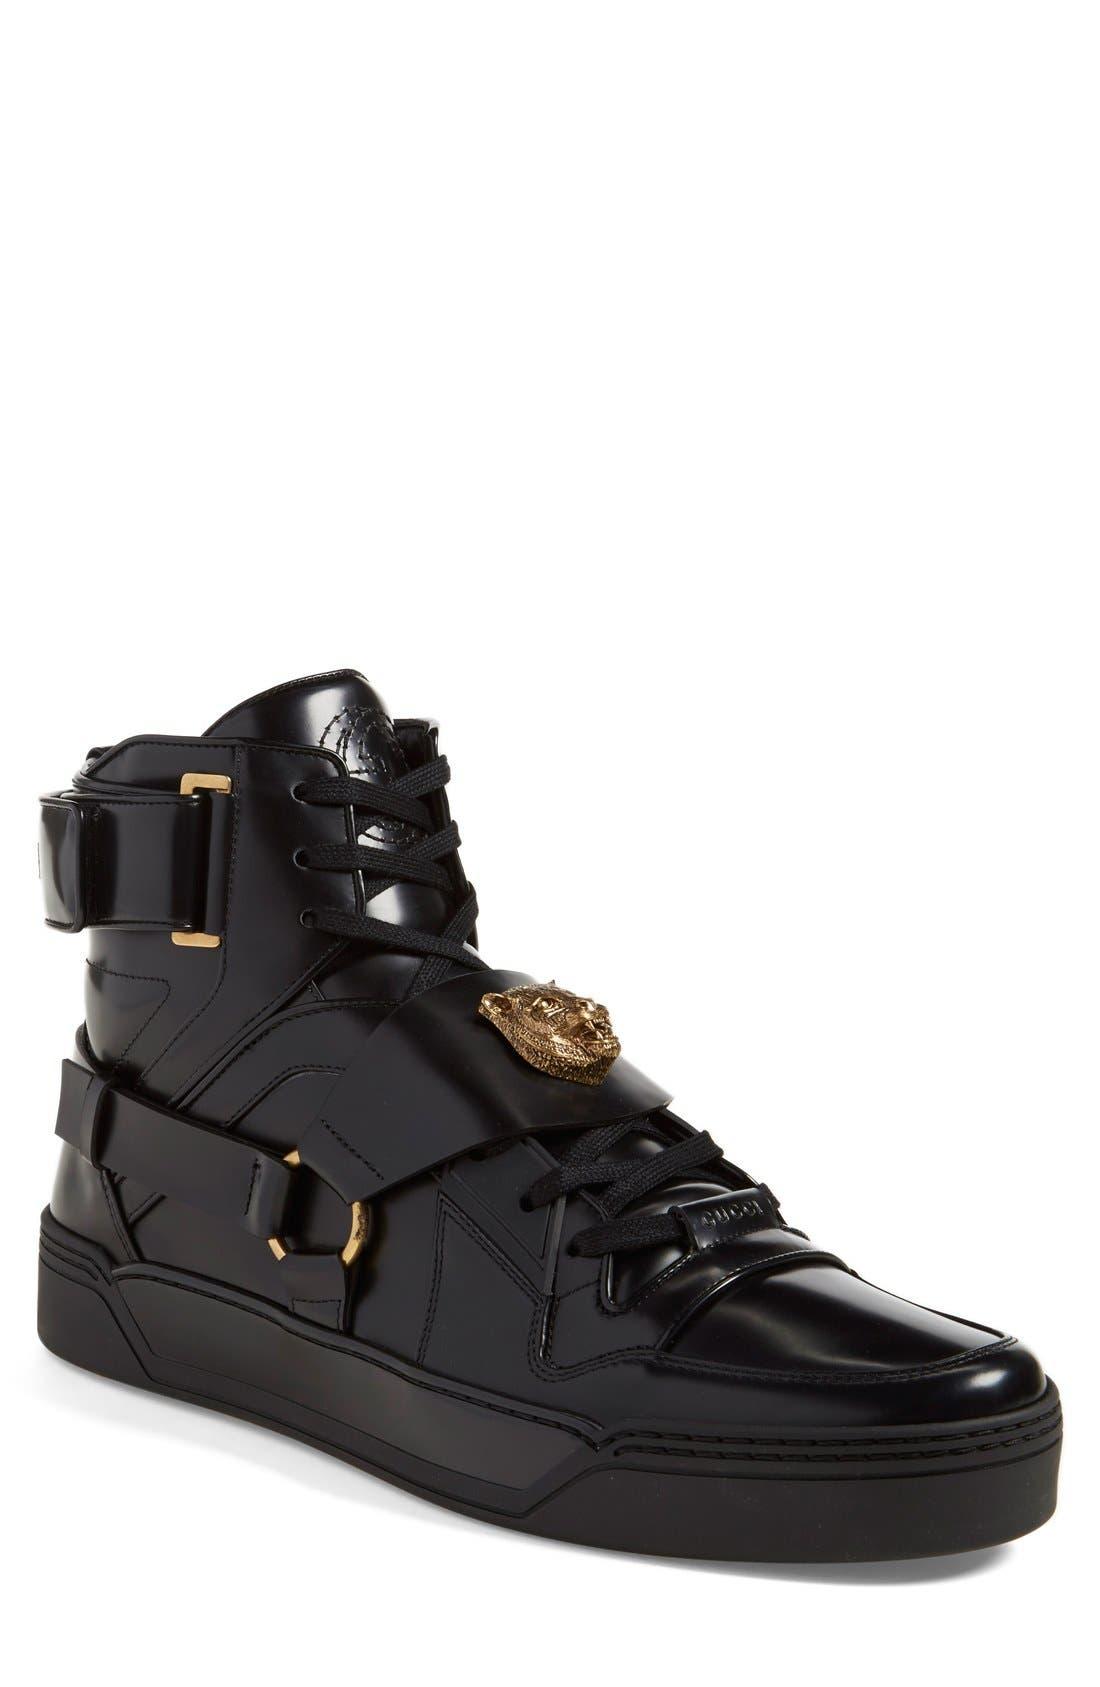 GUCCI 'Tiger' High Top Sneaker, Main, color, 001